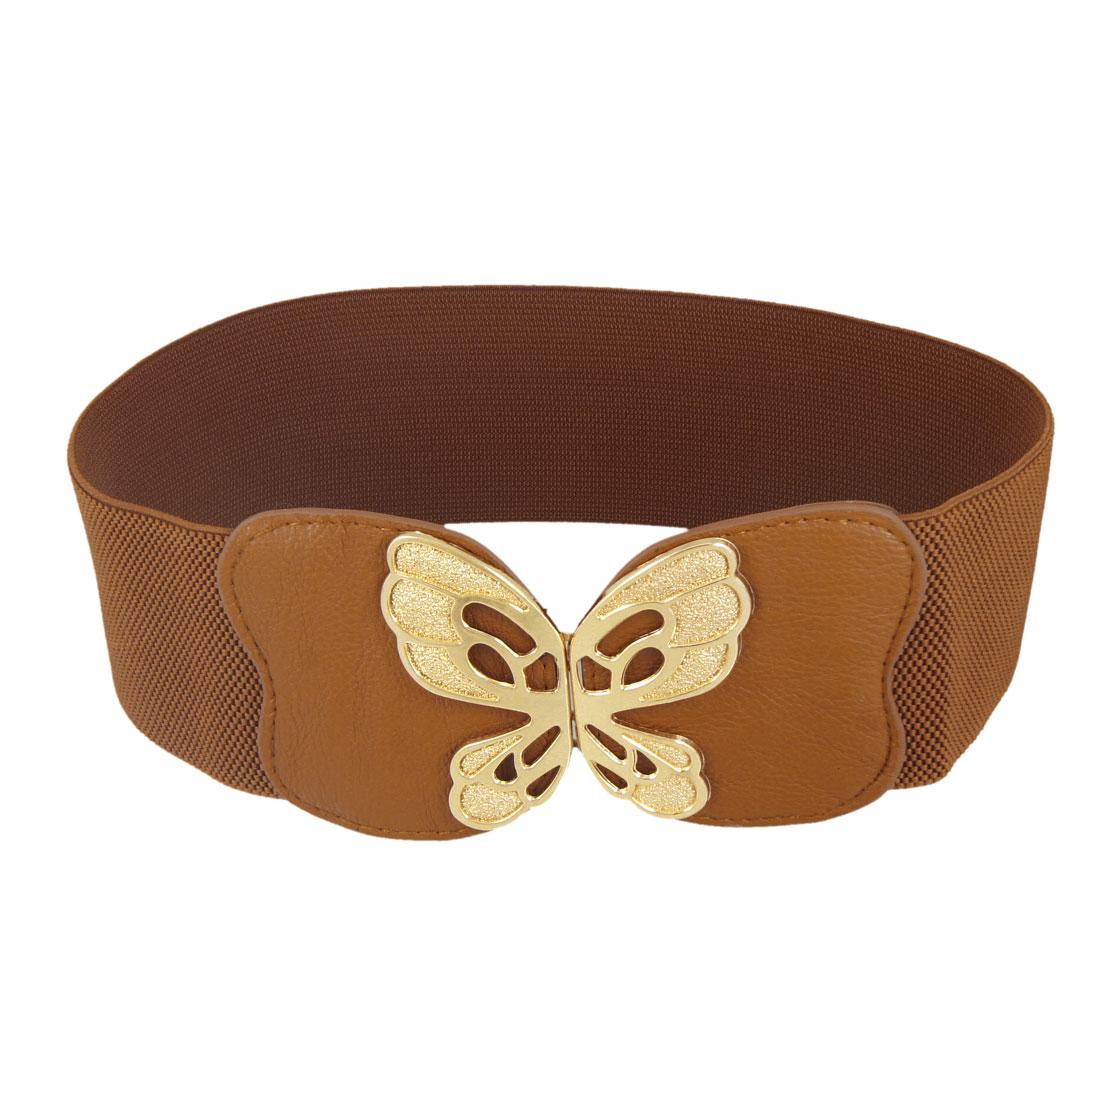 Brown Interlocking Buckle Gold Tone Metal Butterfly Decor Elastic Waistband Belt